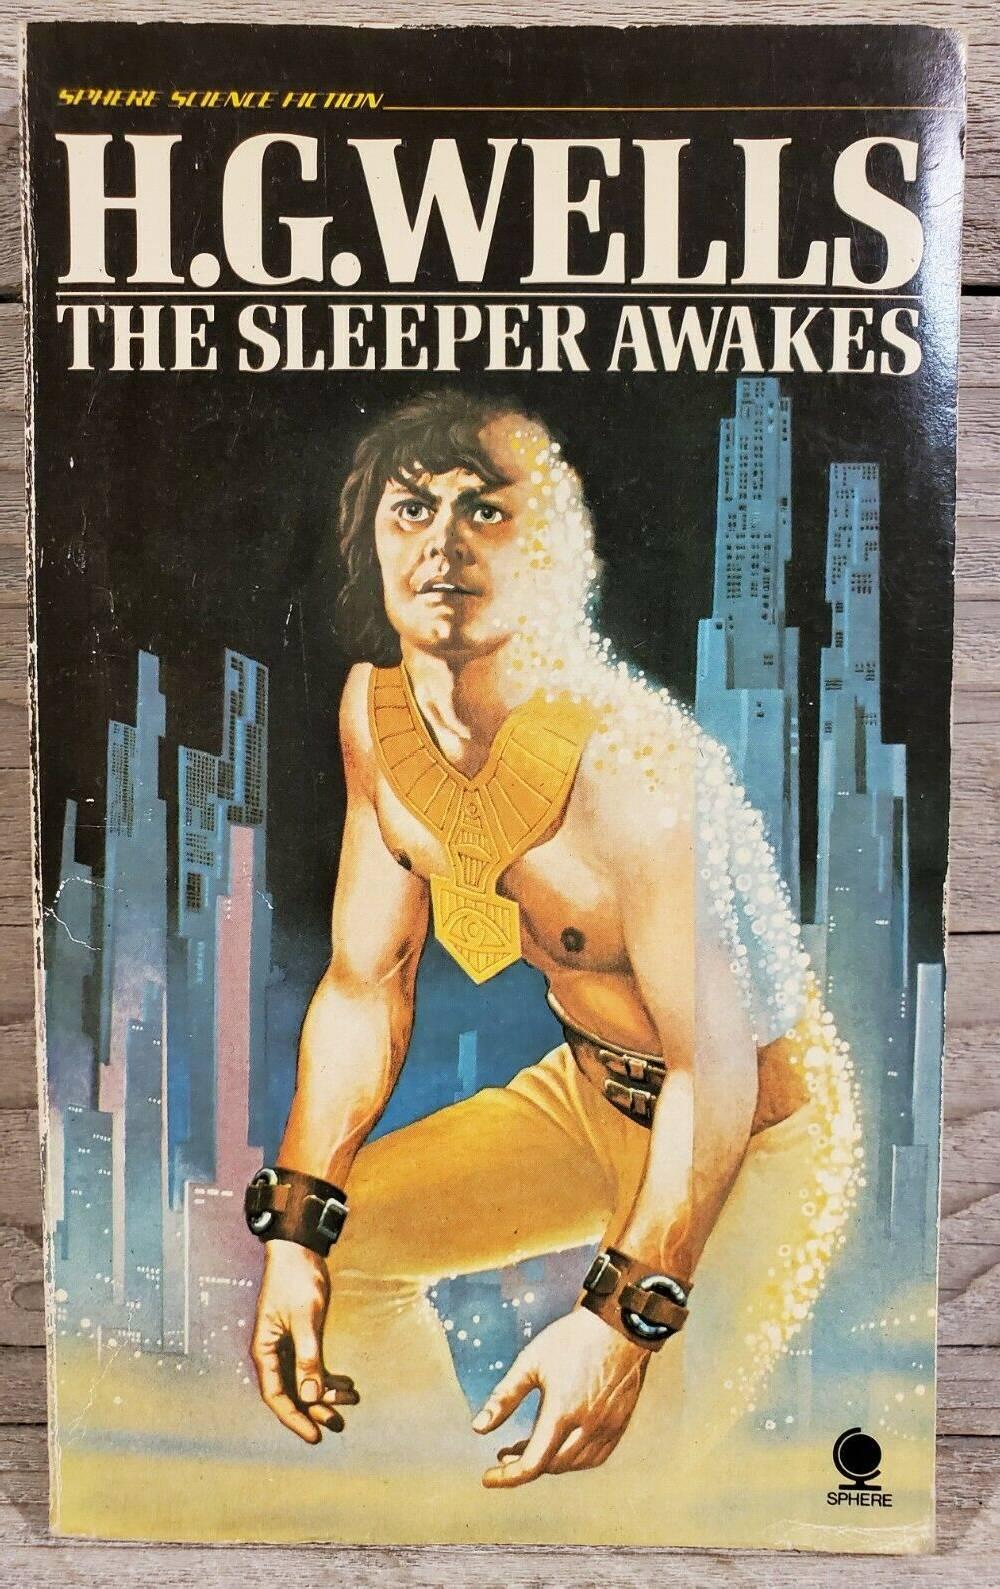 The sleeper's nips awake